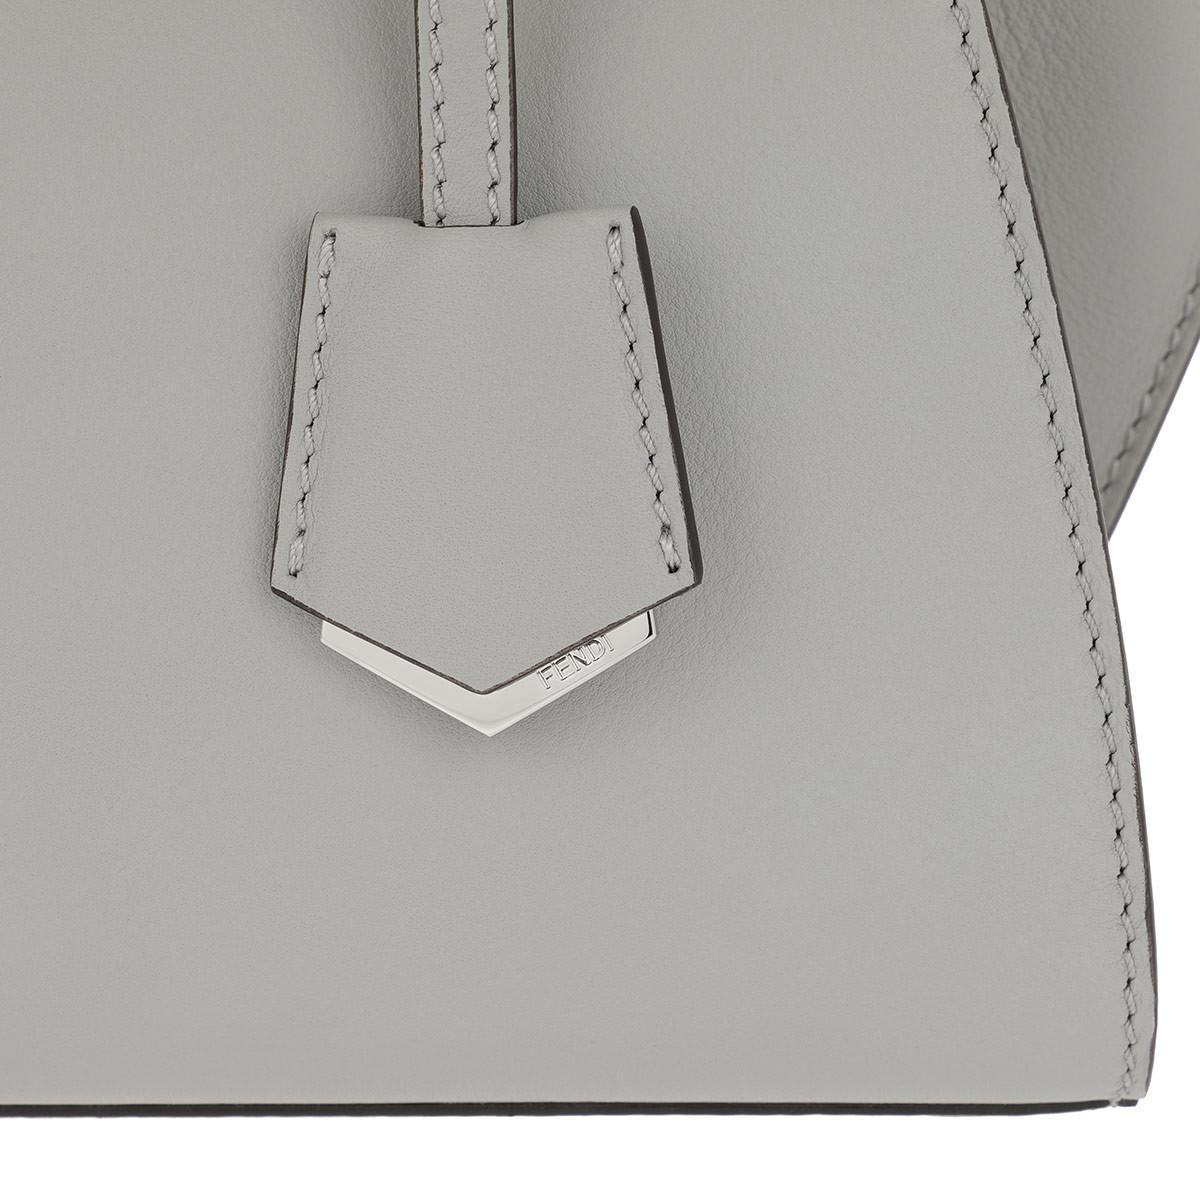 Fendi Leather 3jours Mini Tote Grey in Grey